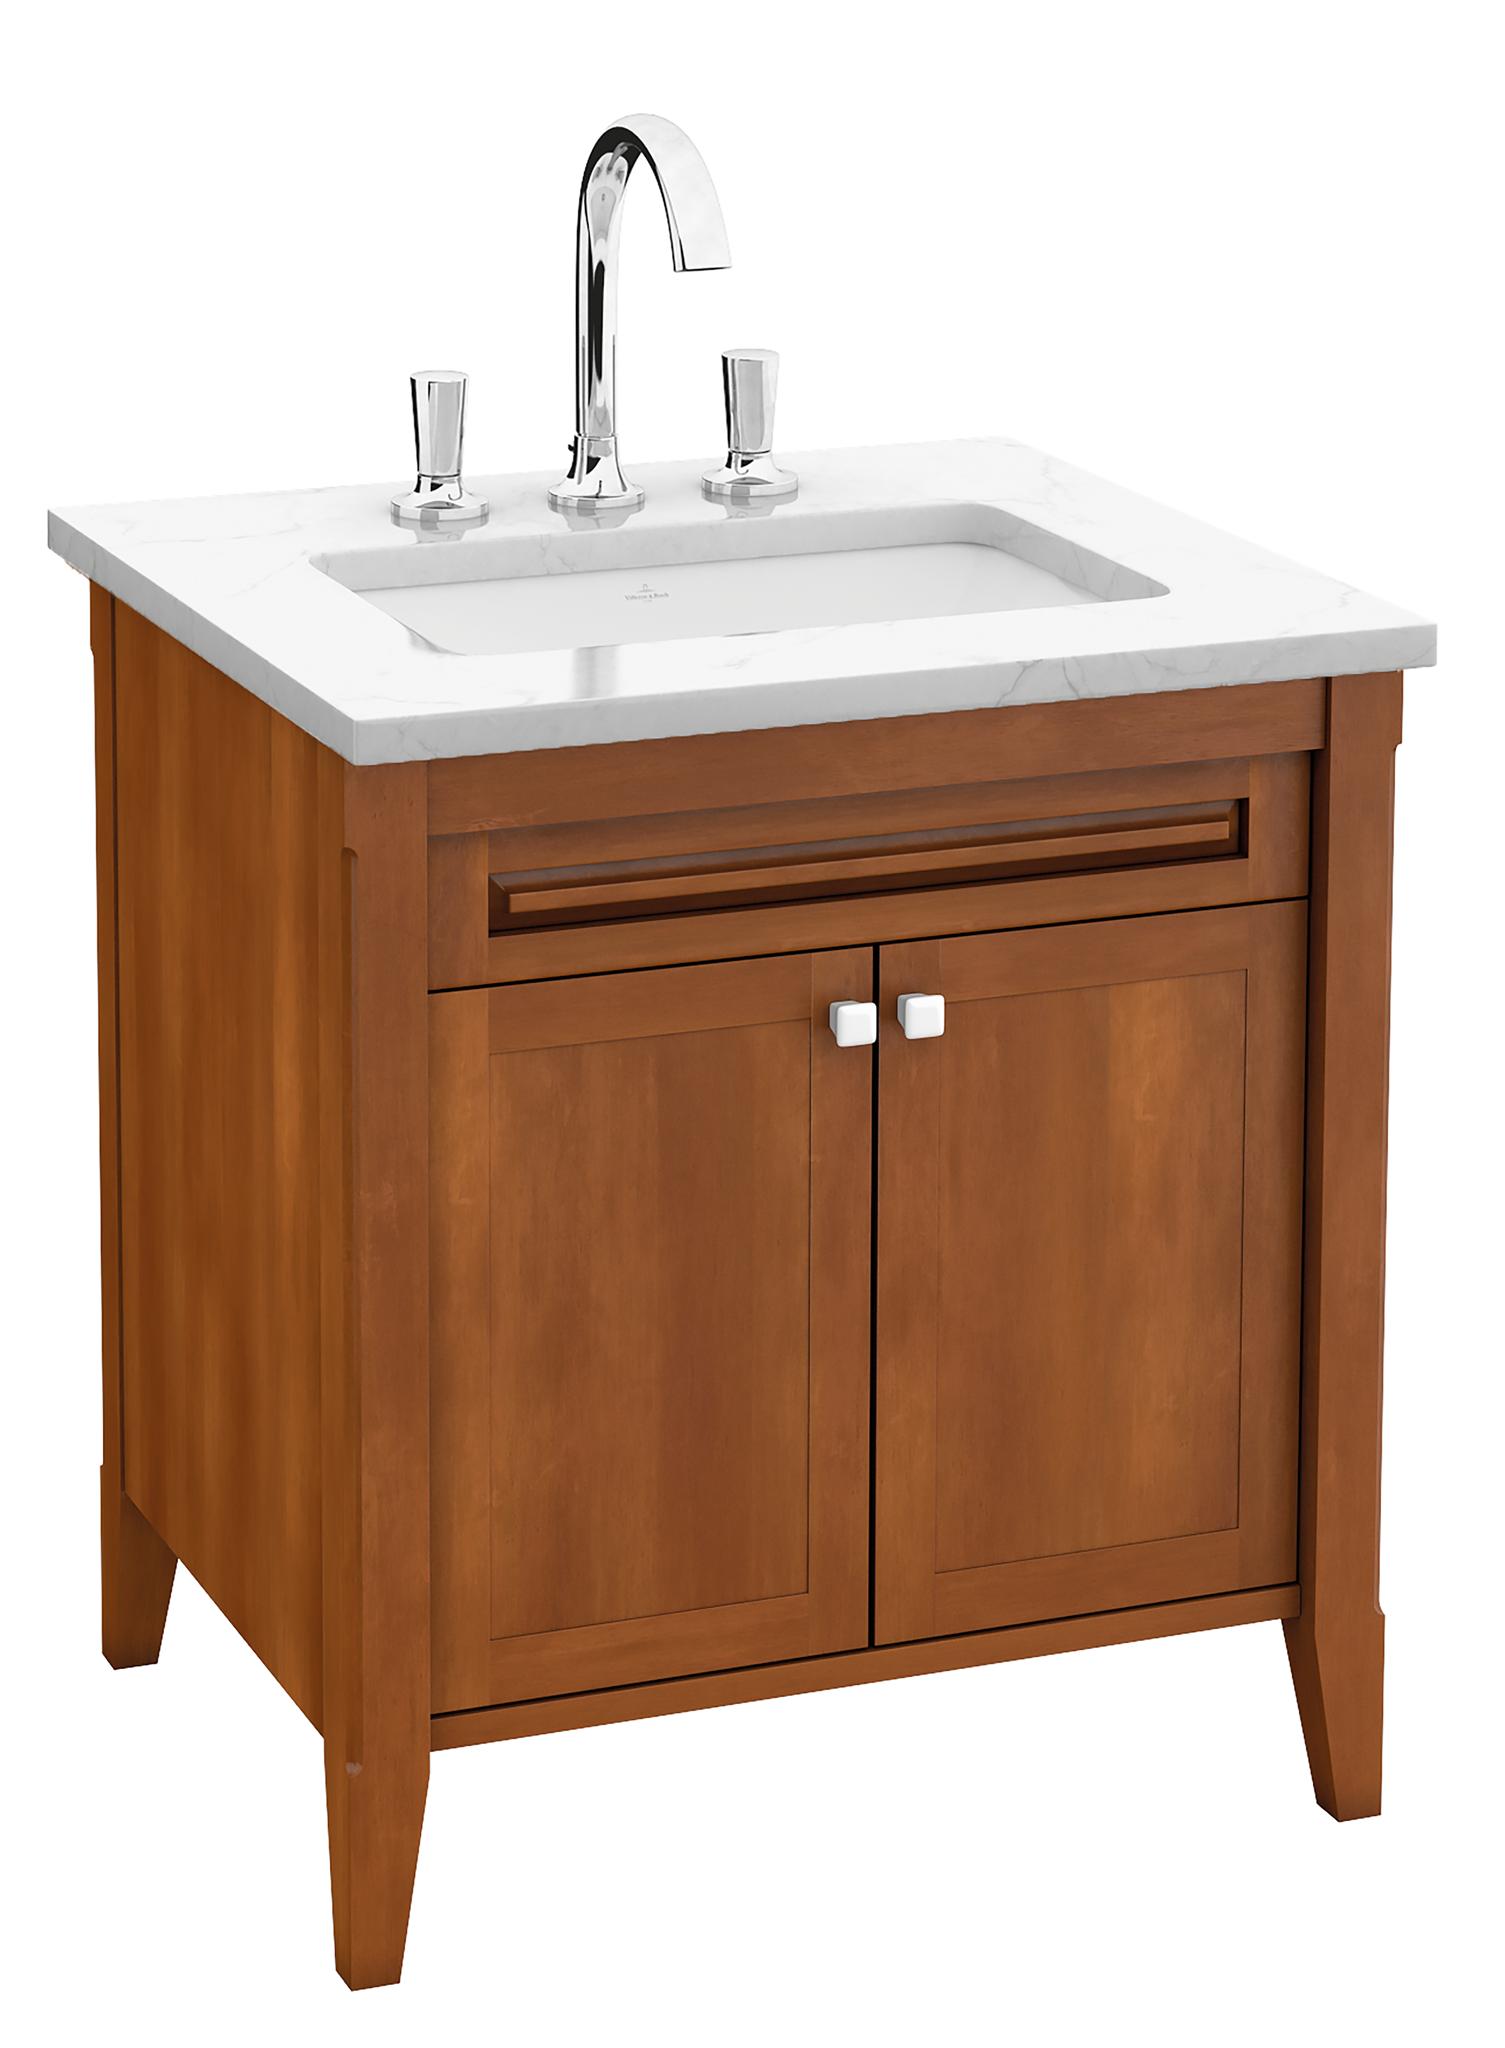 Villeroy and boch bathroom cabinets - Strada Bathroom Furniture Vanity Unit For Washbasin Vanity Units